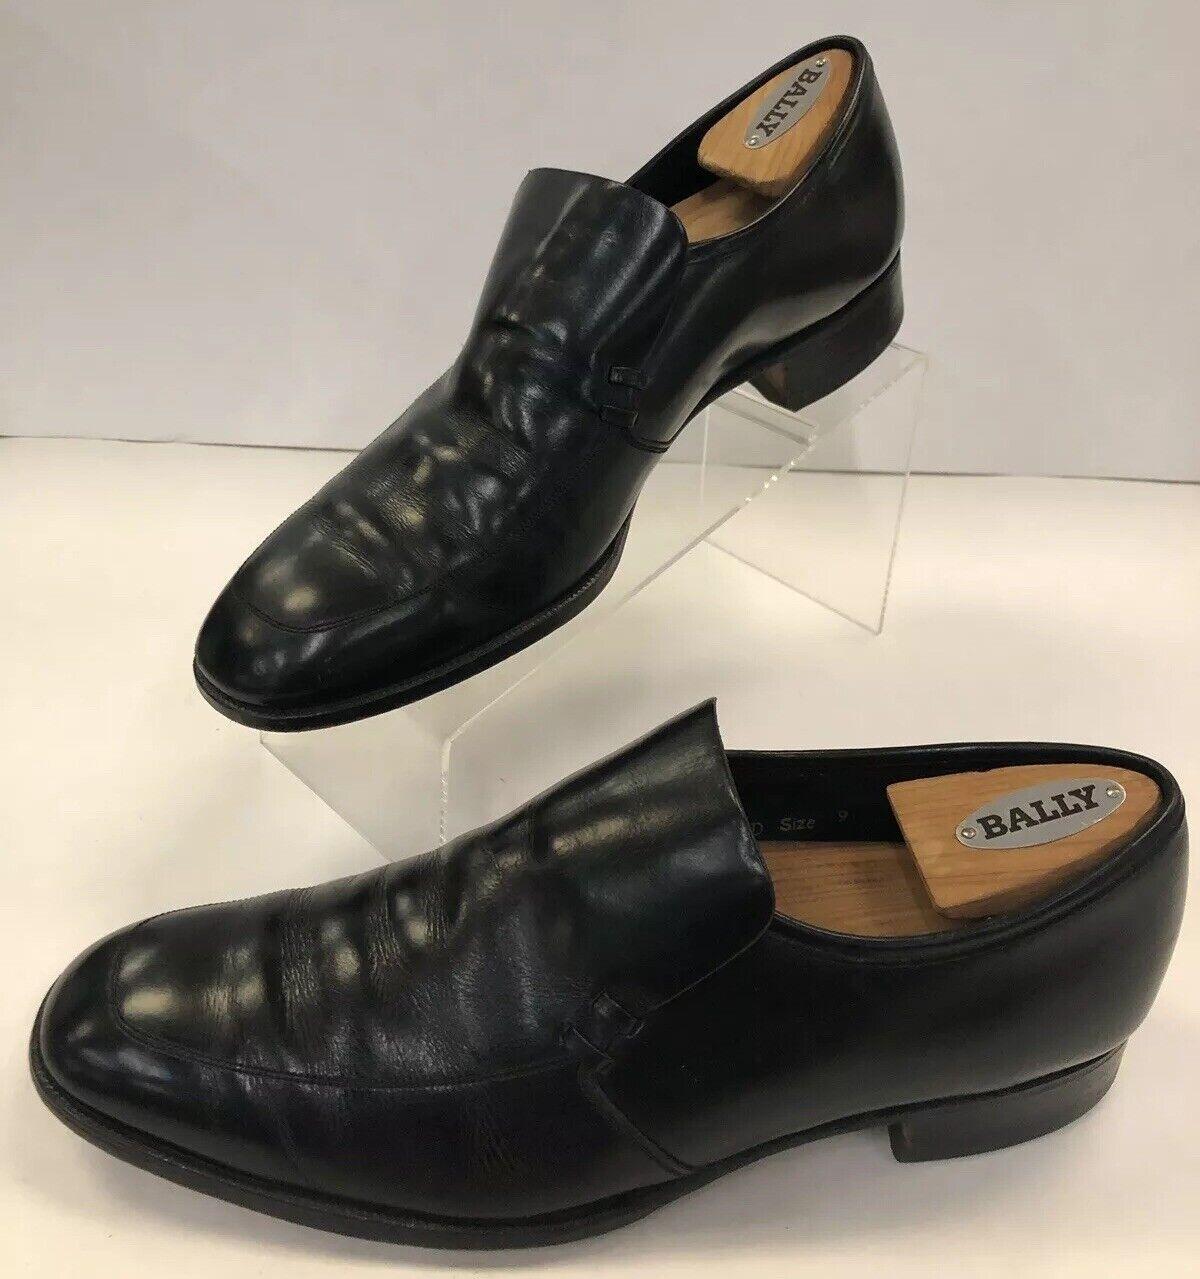 Chaussures par blanchall Chaussure no 2733 dernier 5226 Taille 9 D en cuir noir Robe Mocassins